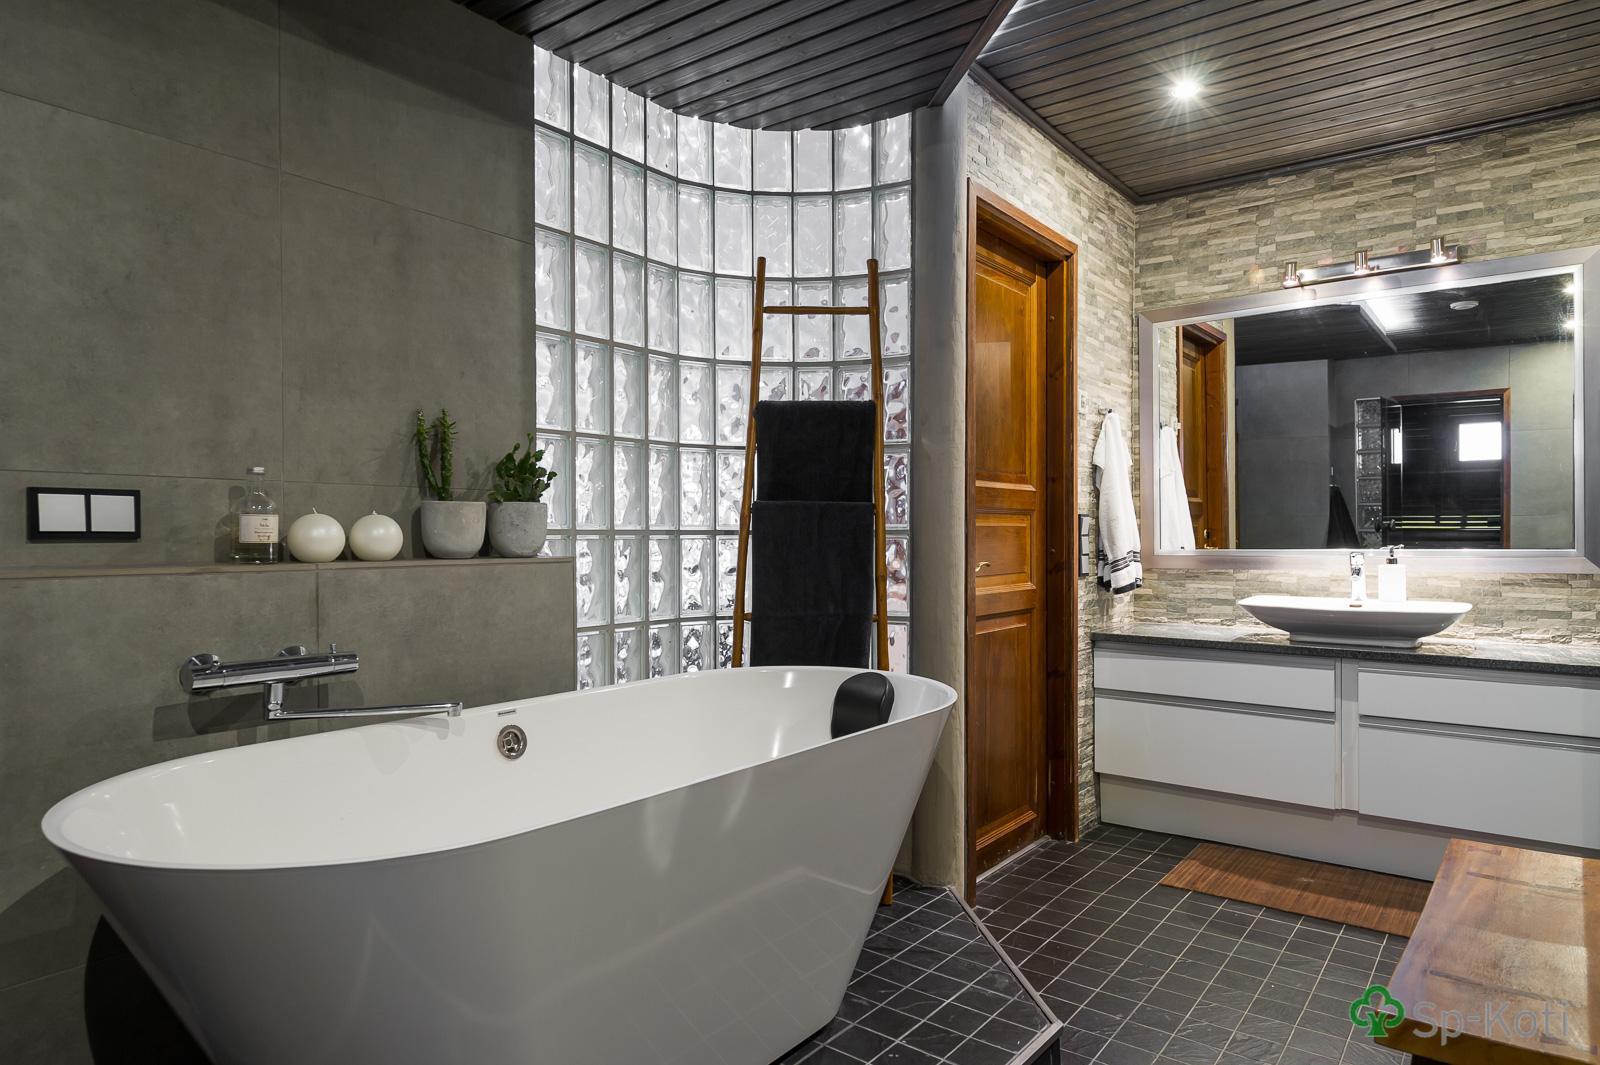 Moderni kylpyhuone 9589297  Etuovi com Ideat & vinkit